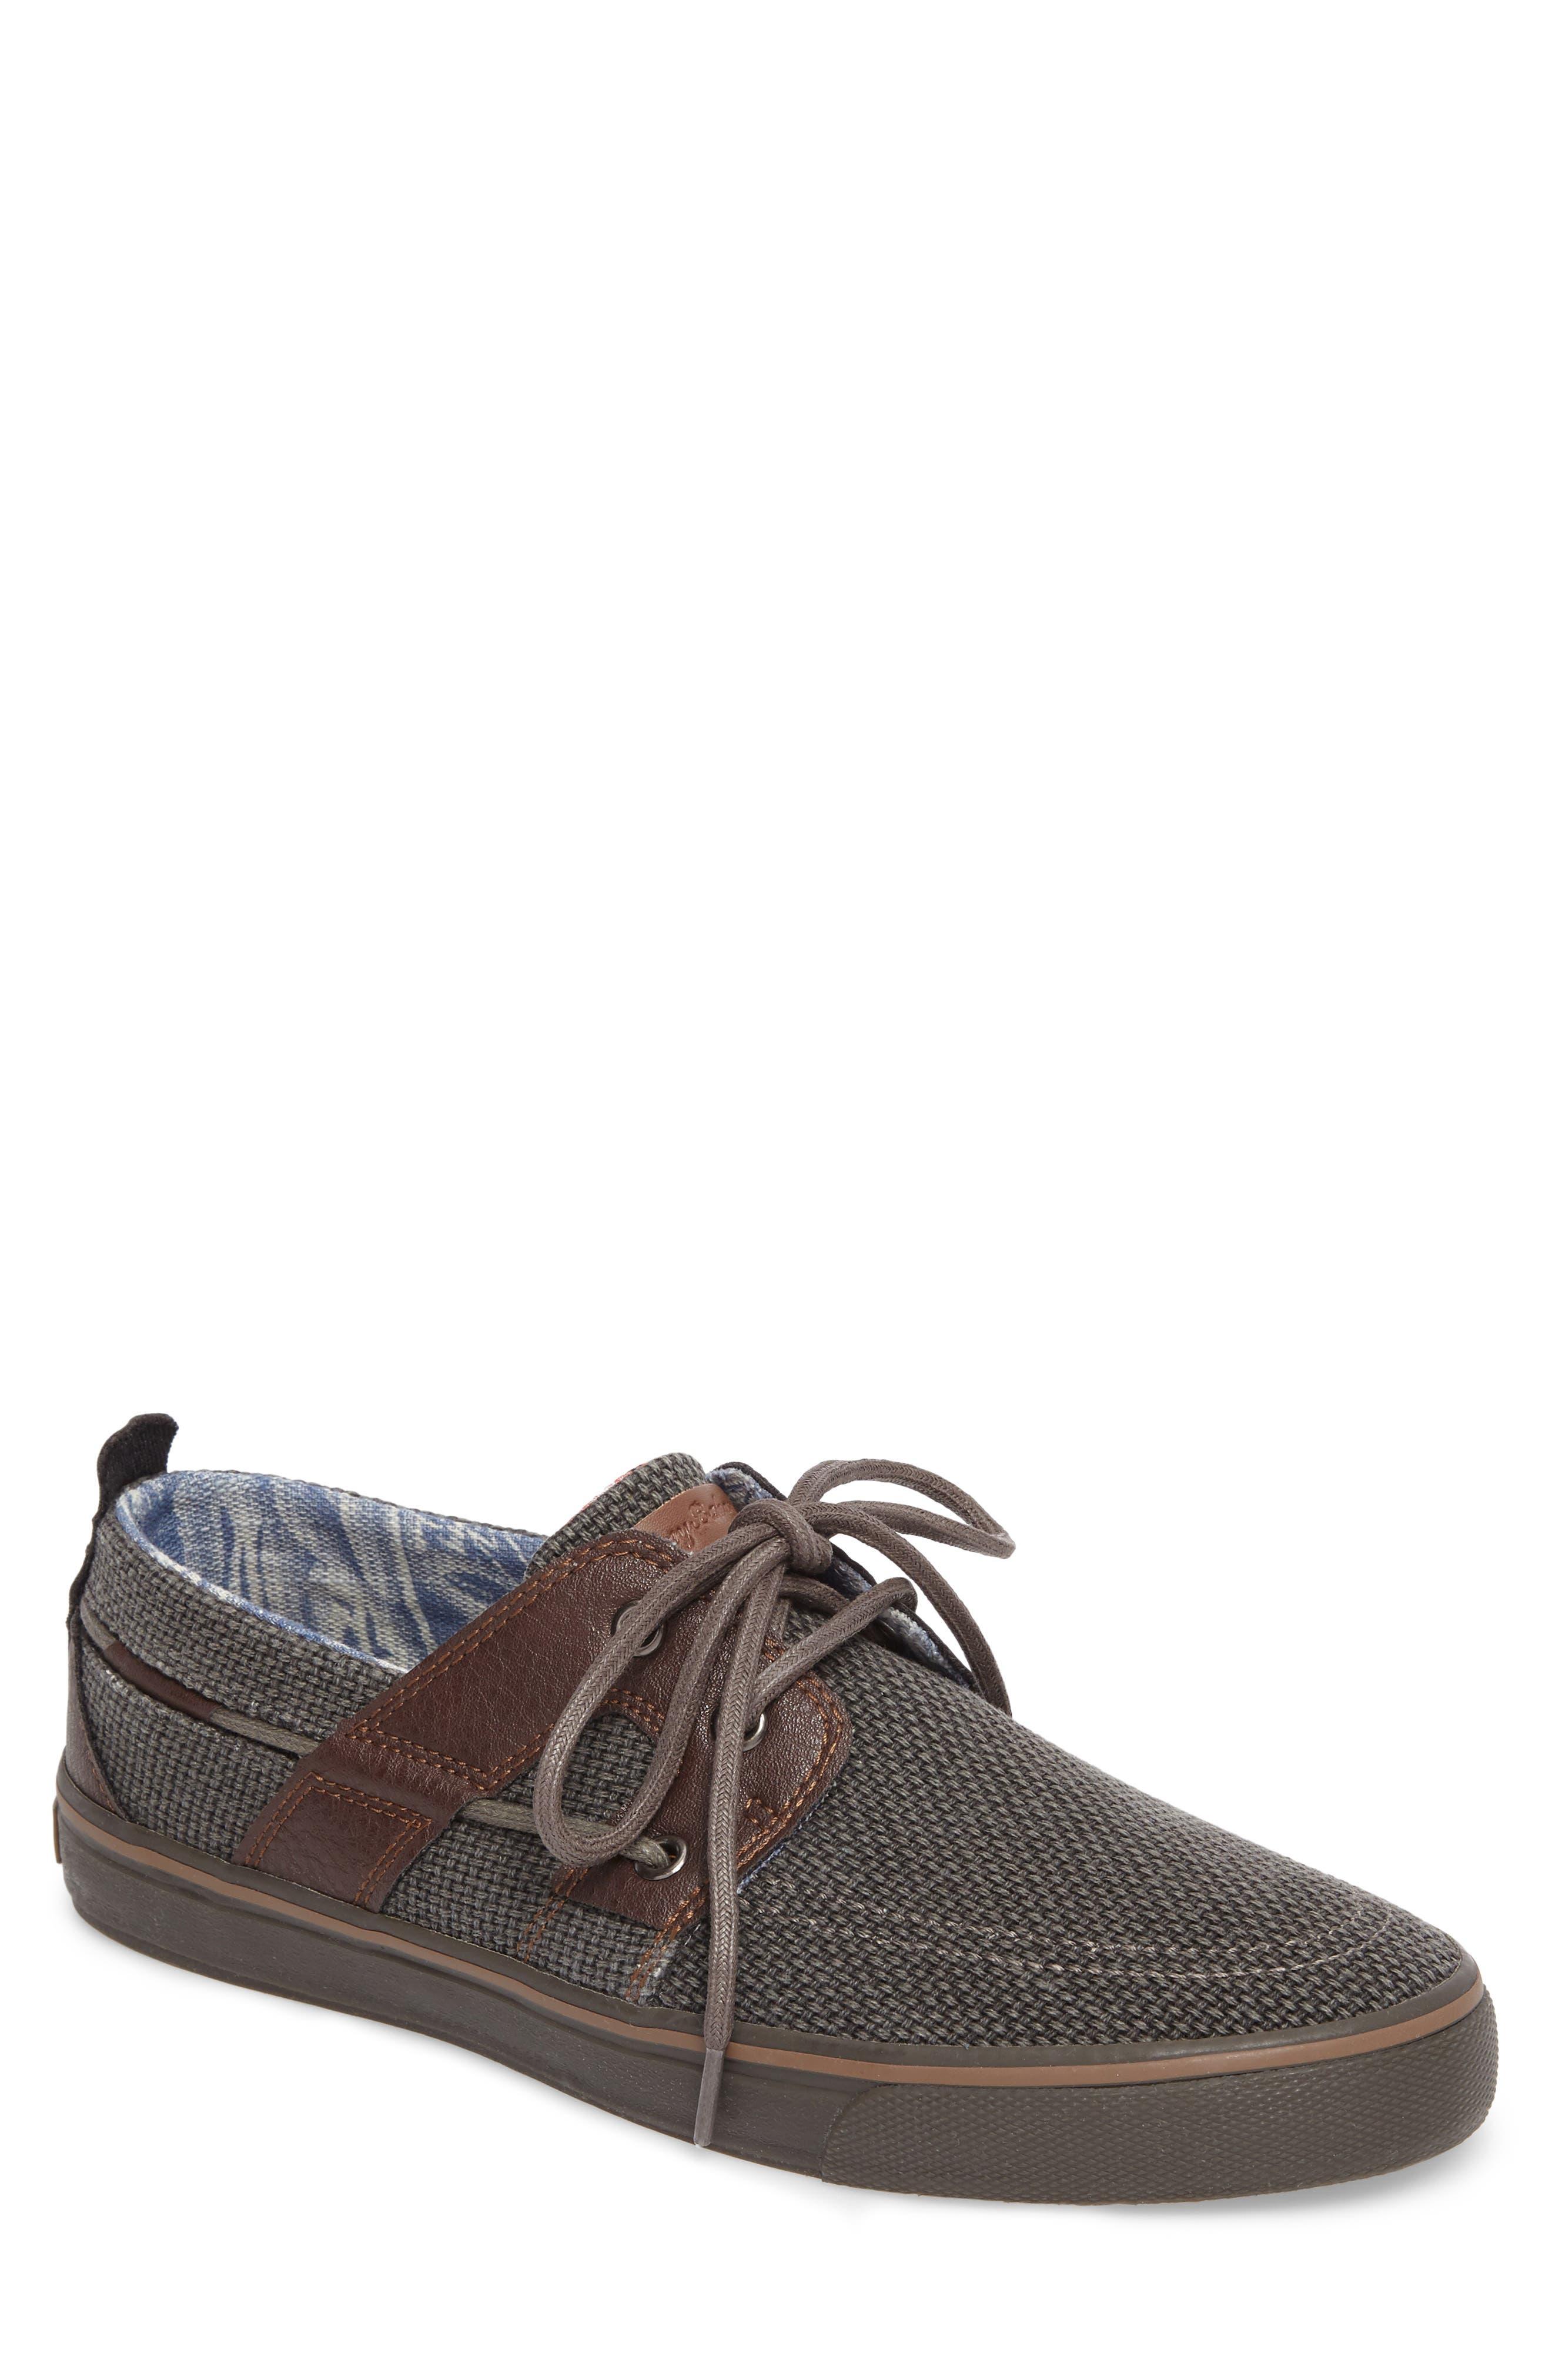 Stripe Breaker Sneaker,                             Main thumbnail 1, color,                             Dark Grey/ Dark Brown